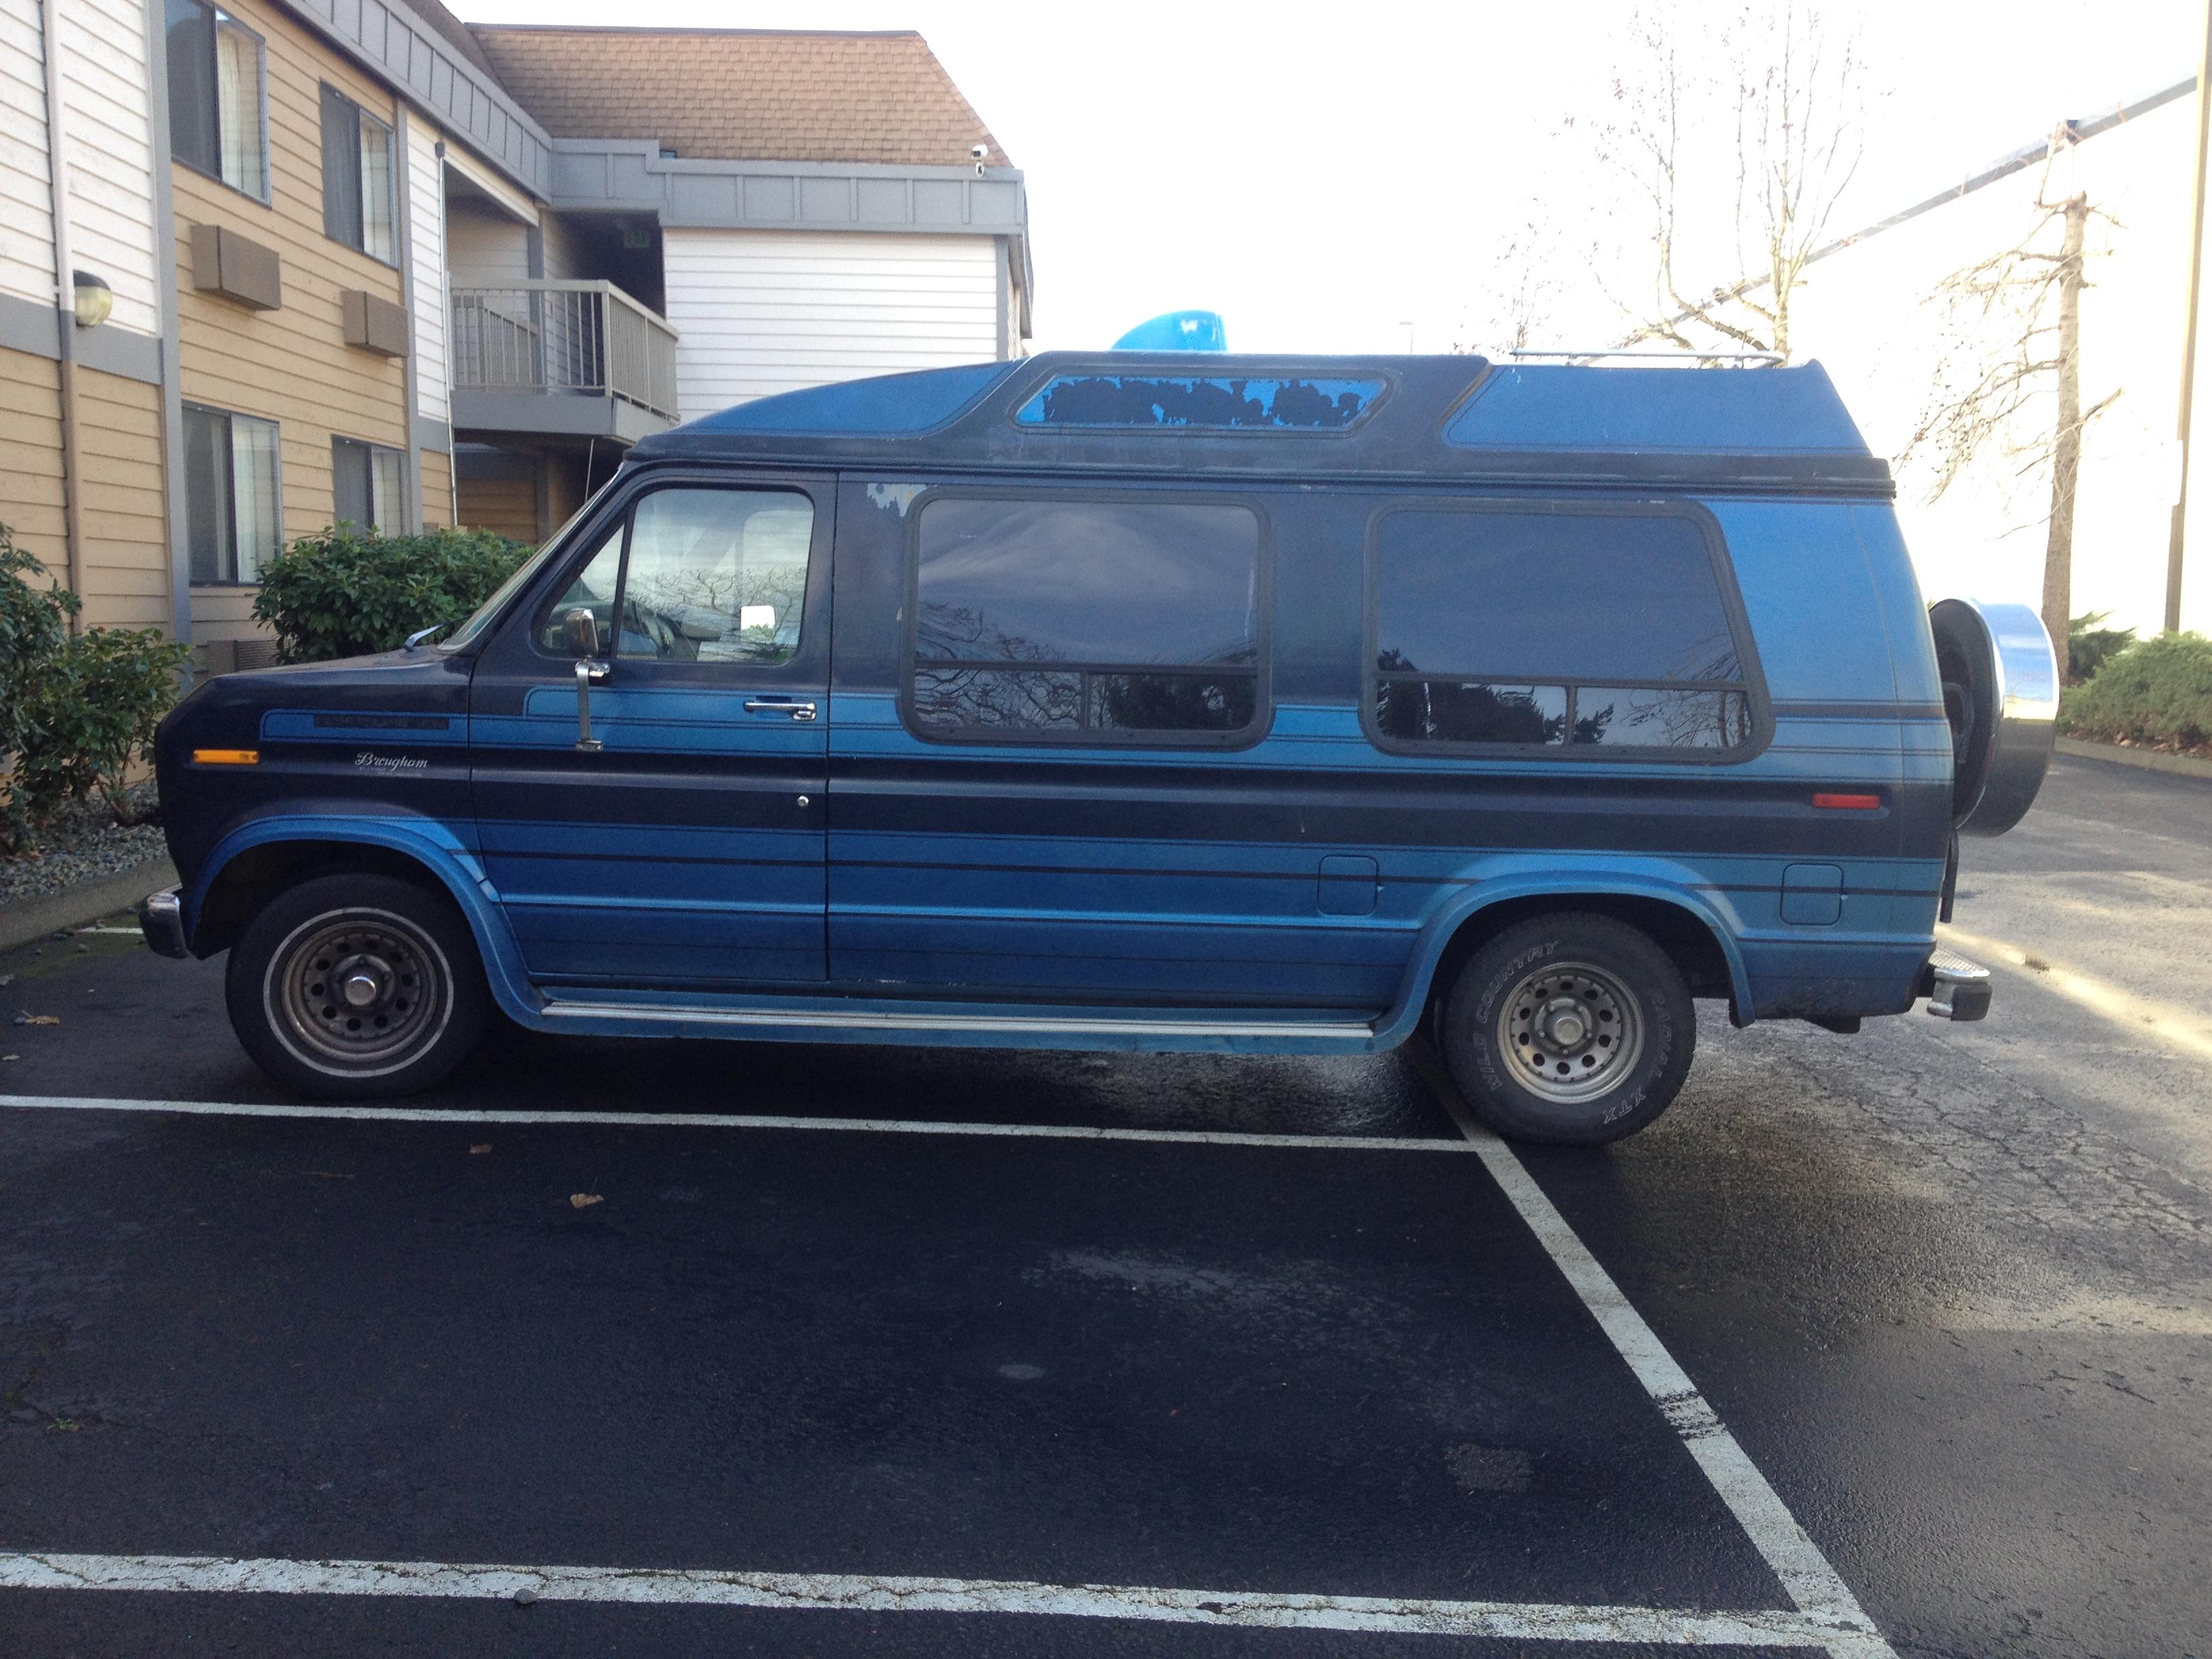 Buy Junk Cars Ri >> Cash for Cars Hopkinton, RI | Sell Your Junk Car | The ...